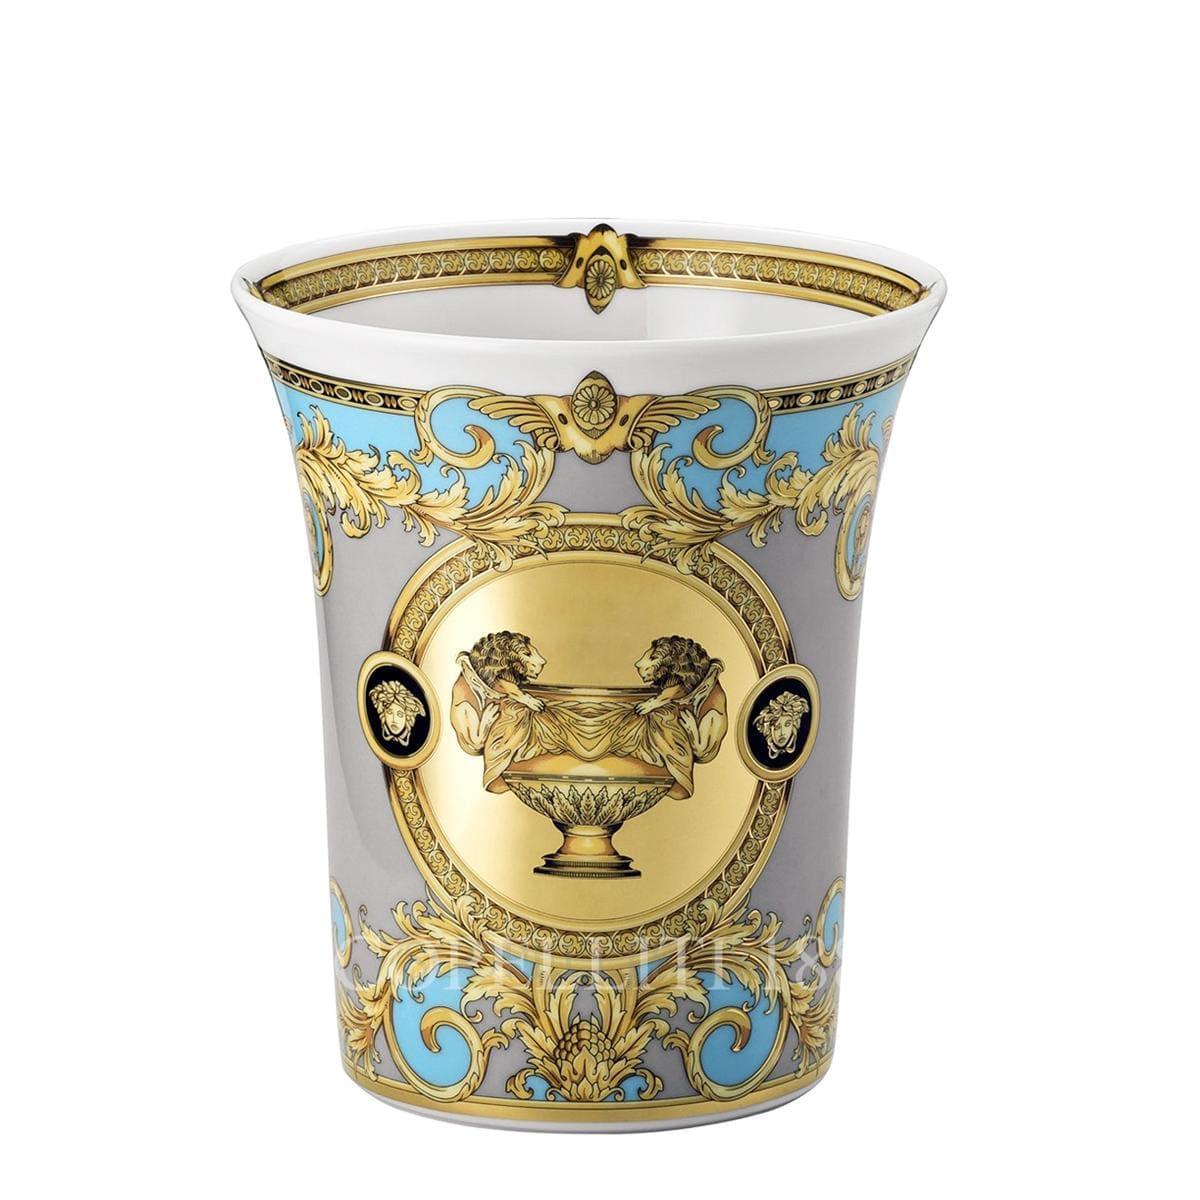 Versace Prestige Gala Le Bleu Vase 18 cm by Rosenthal